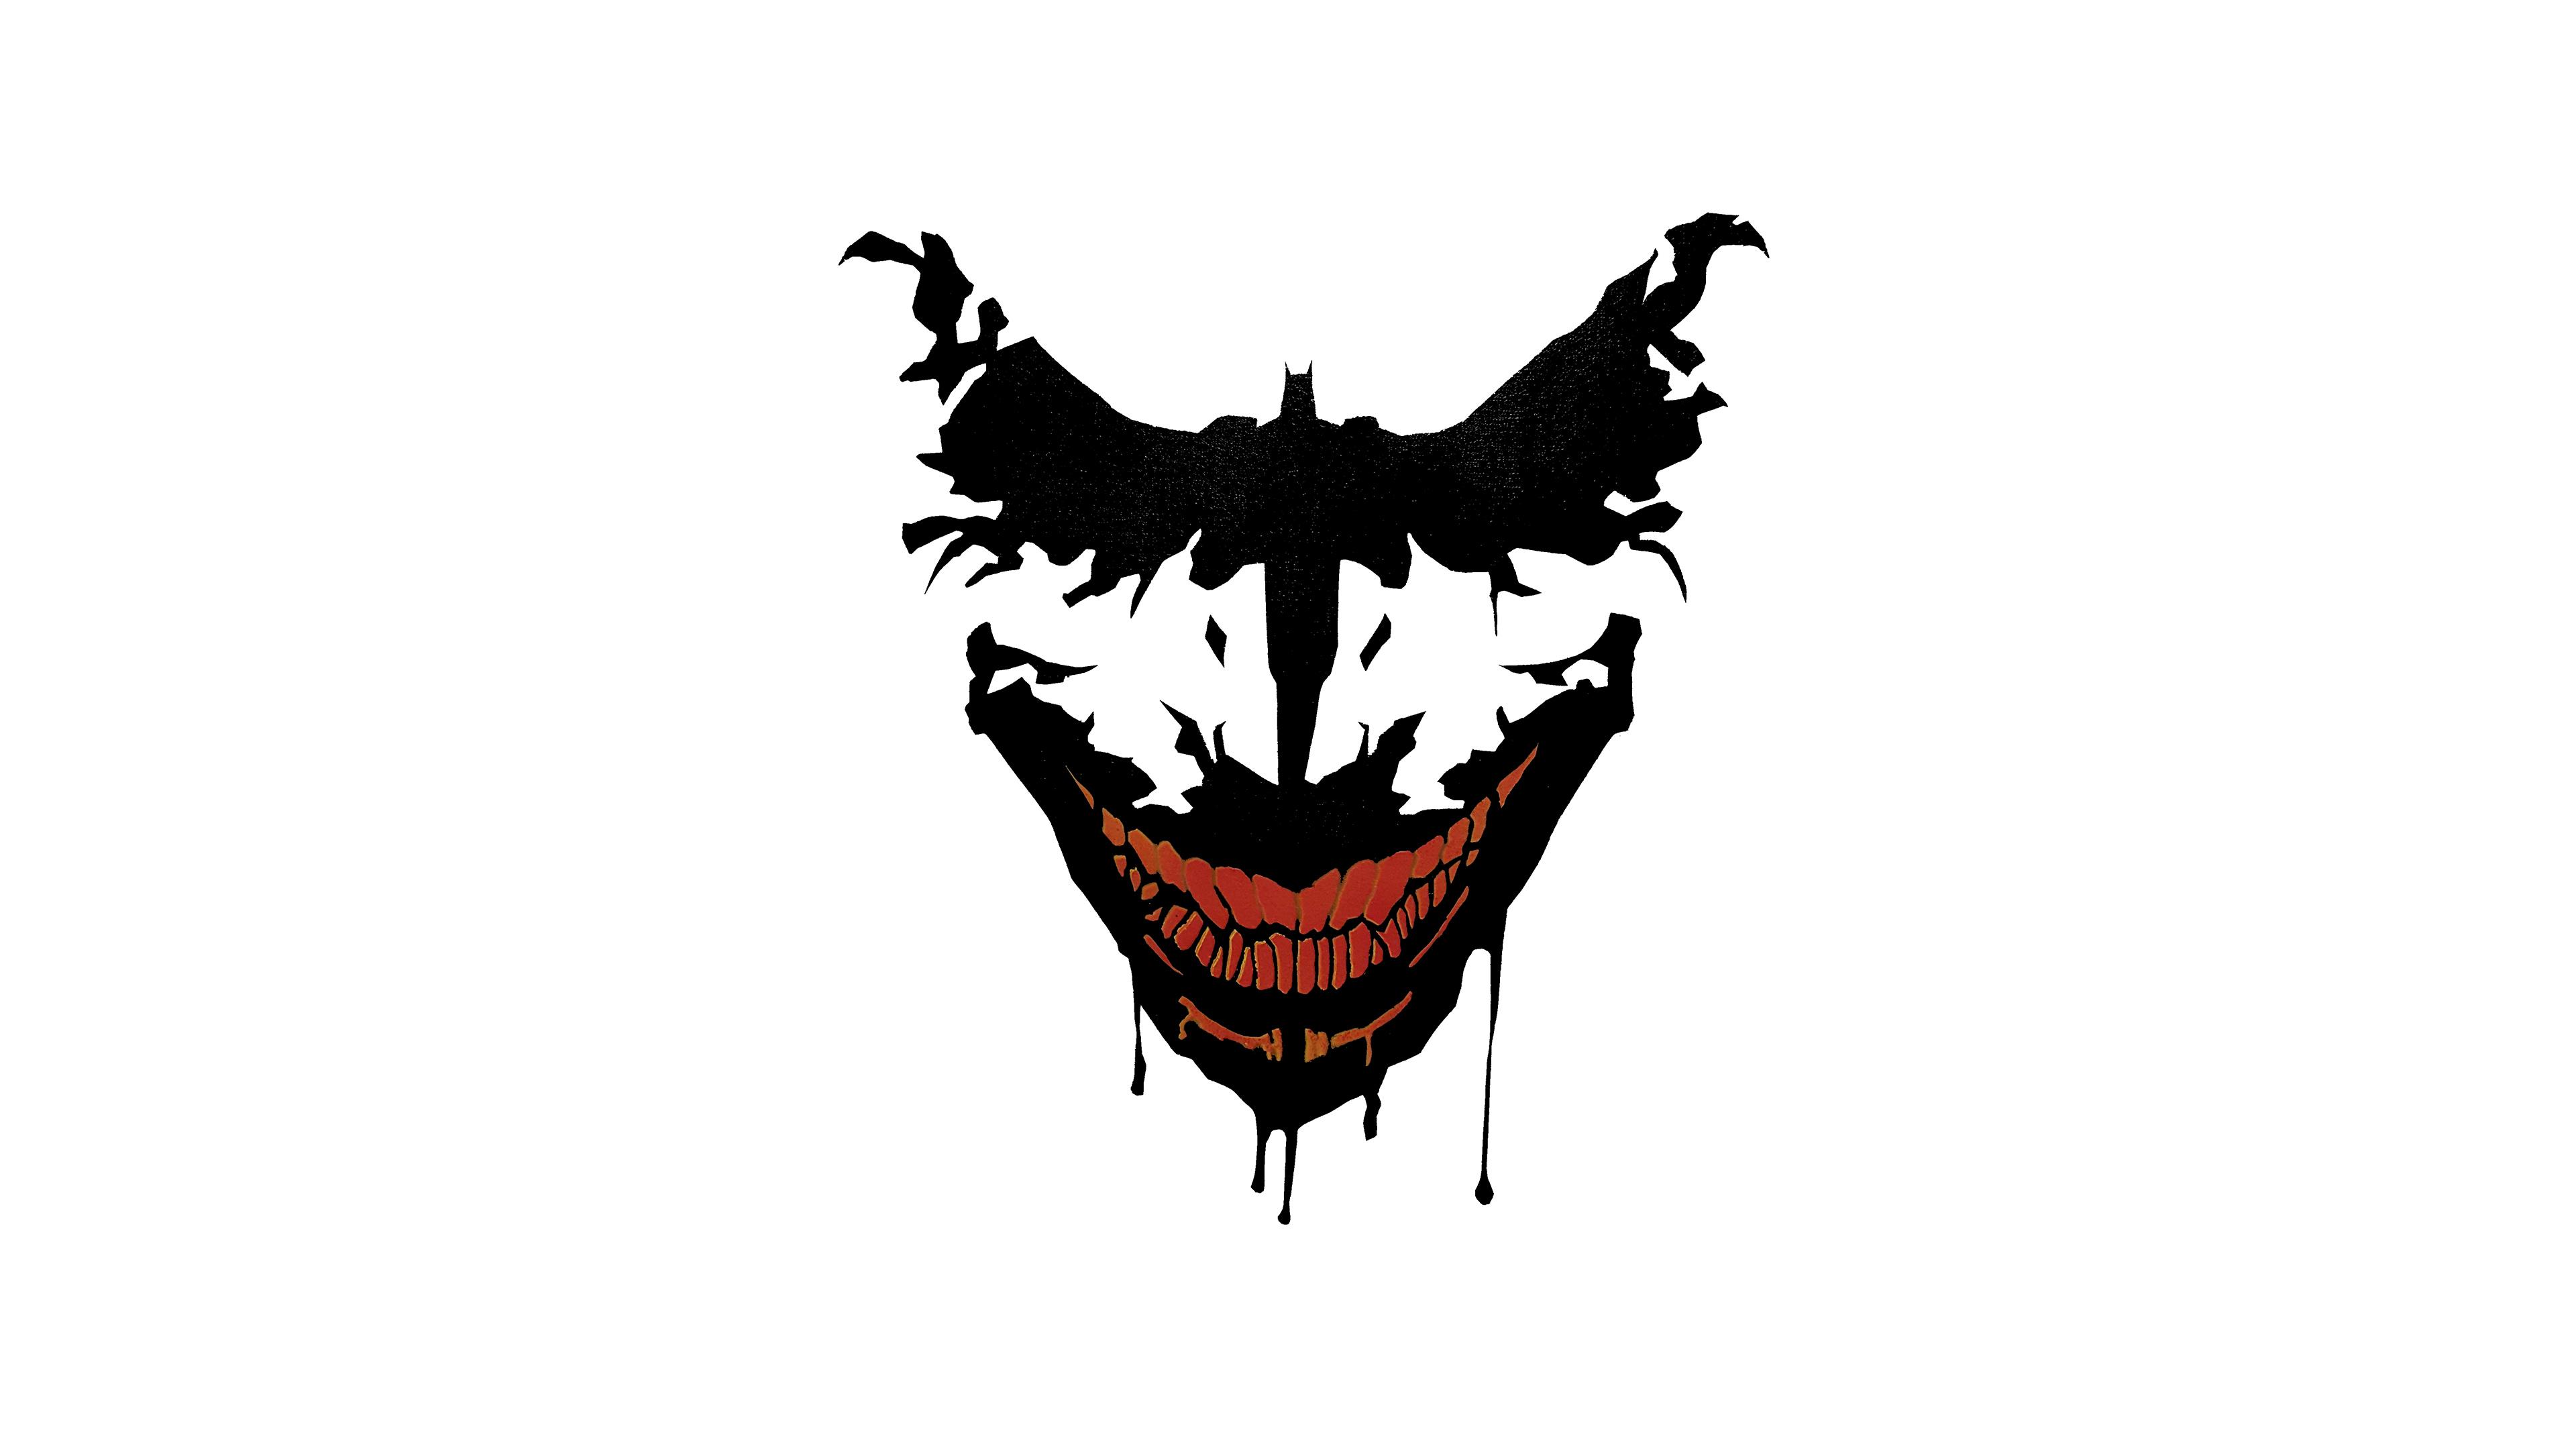 Bat art superheroes k. Joker clipart mobile hd